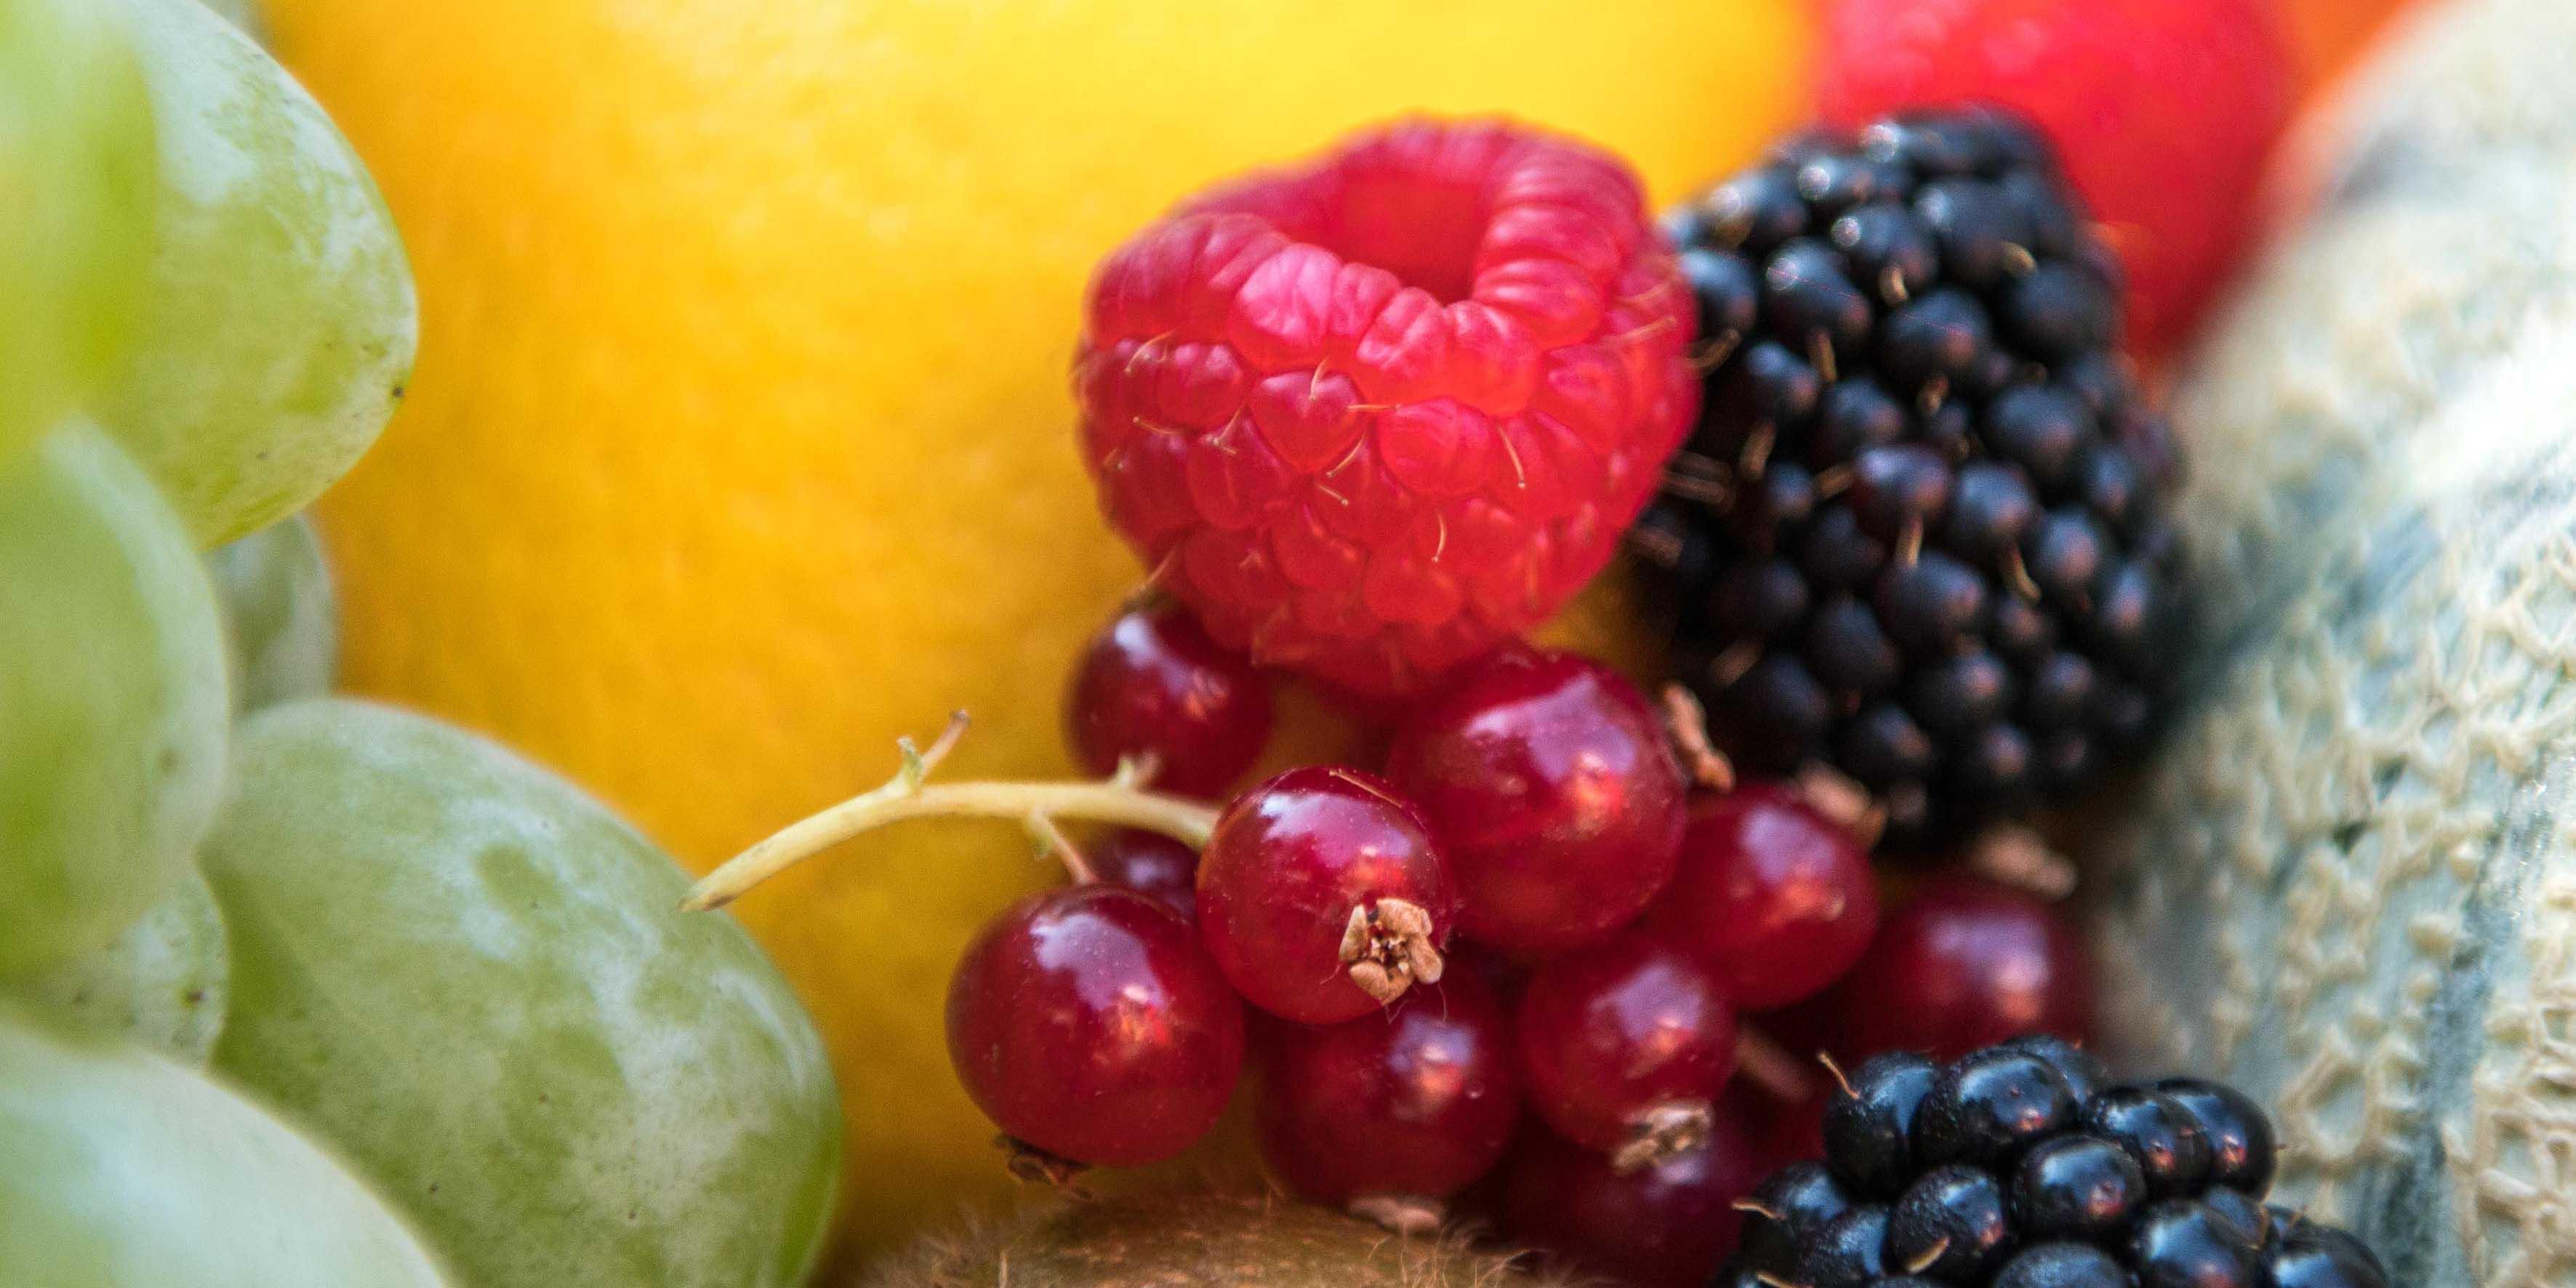 Walter Klunker - Obst